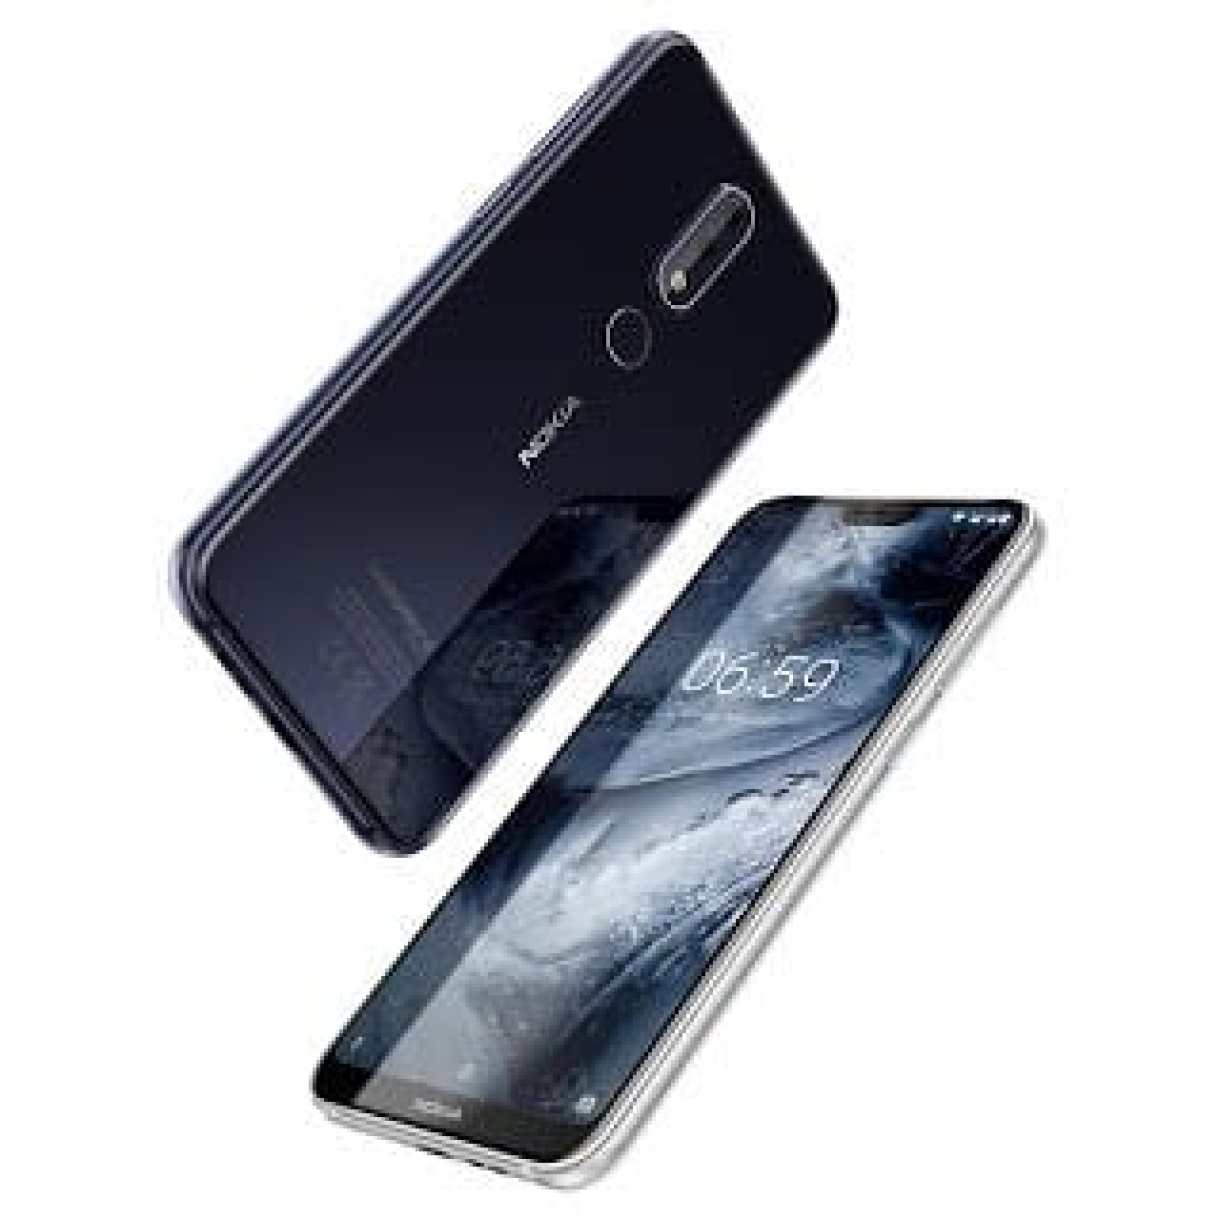 - Nokia 6 - Nokia เปิดตัว Nokia 6.1 Plus สมาร์ทโฟนจอใหญ่ไร้ขอบที่ทุกคนรอคอย